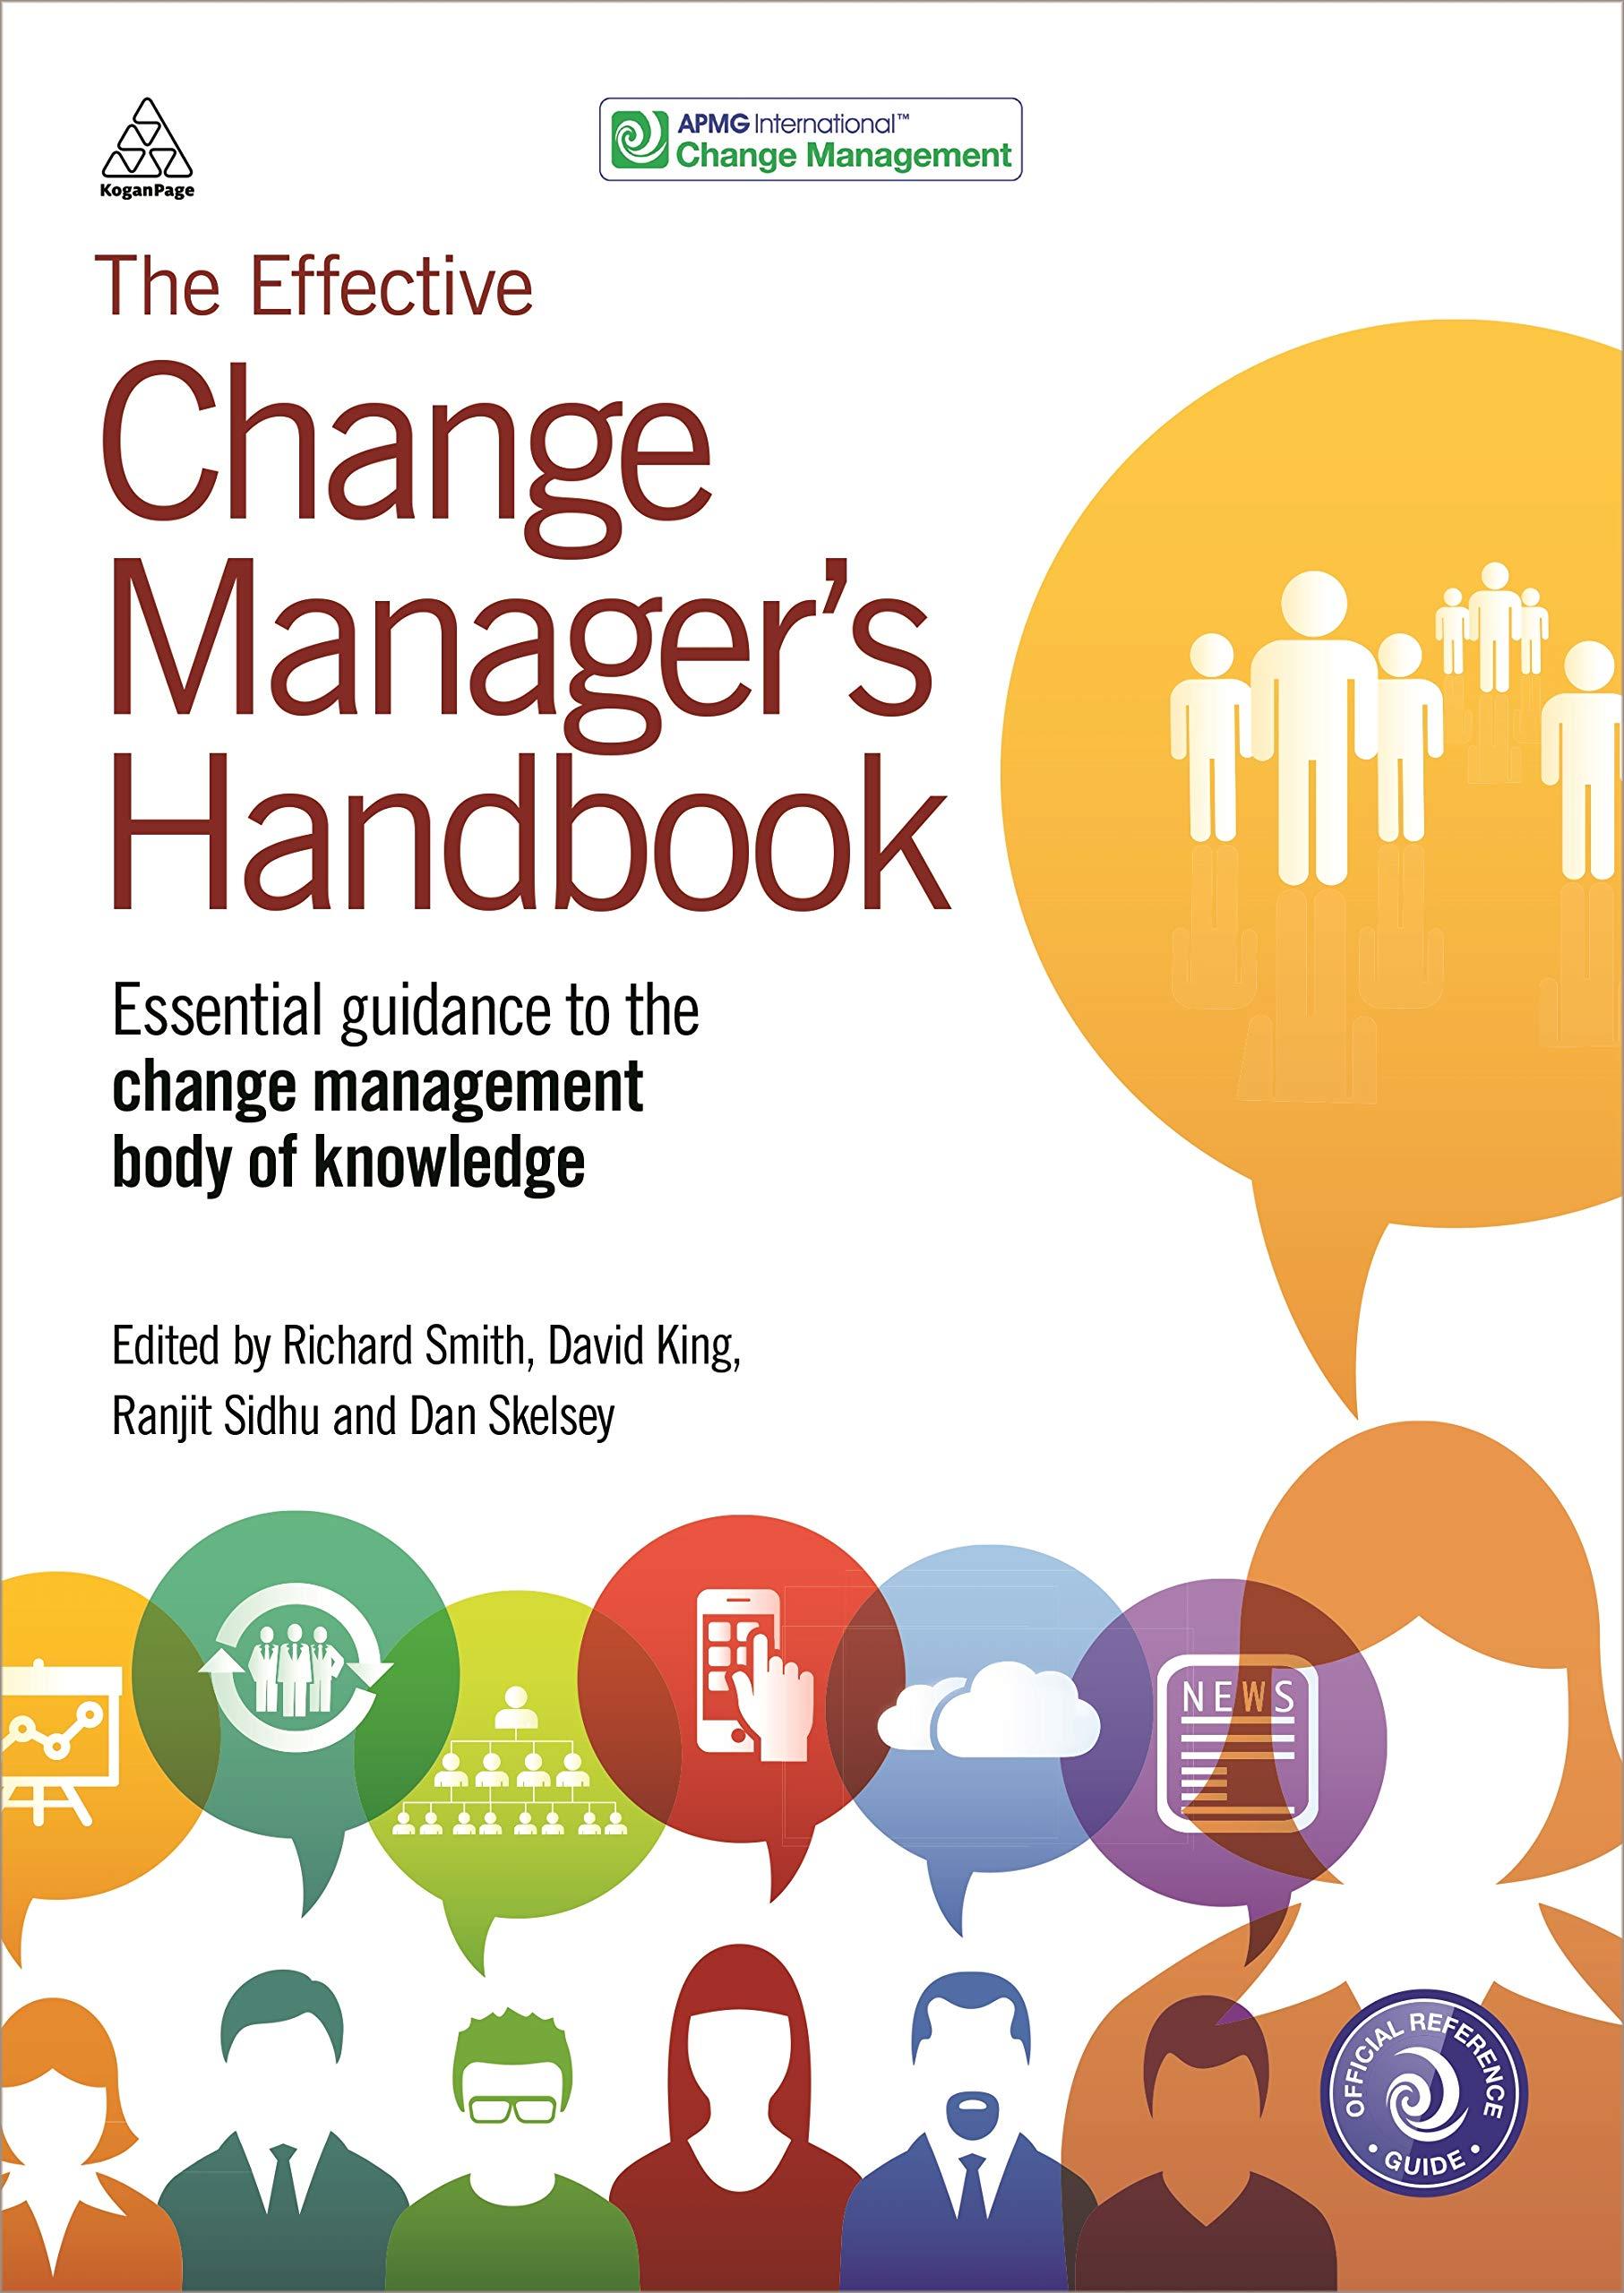 Effective change manager's handbook